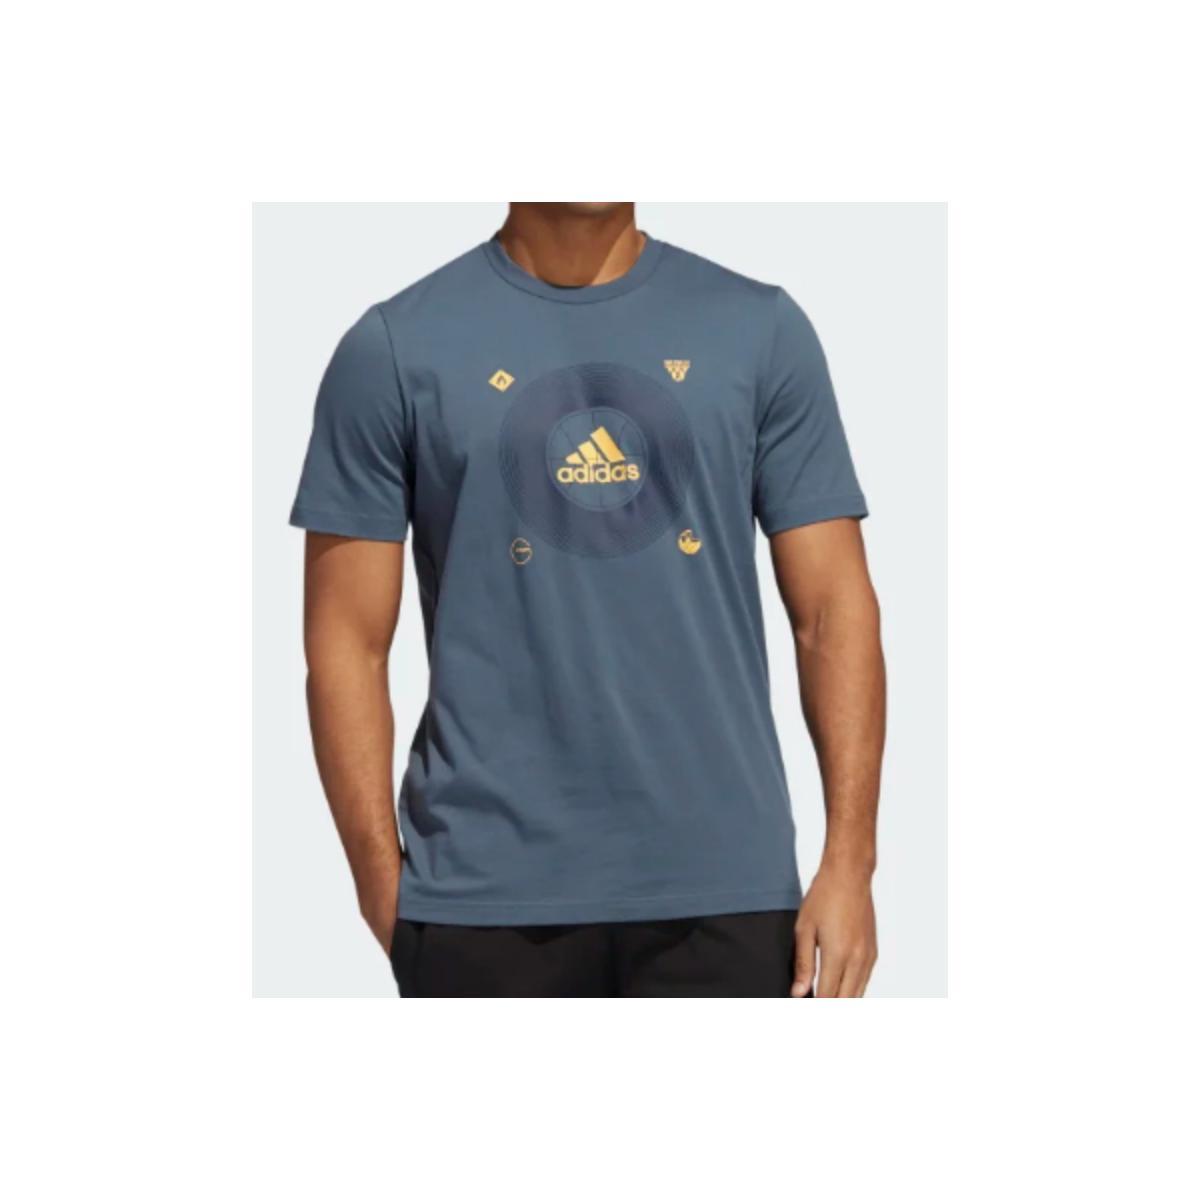 Camiseta Masculina Adidas Ge4512 Bos Icons m  Petróleo